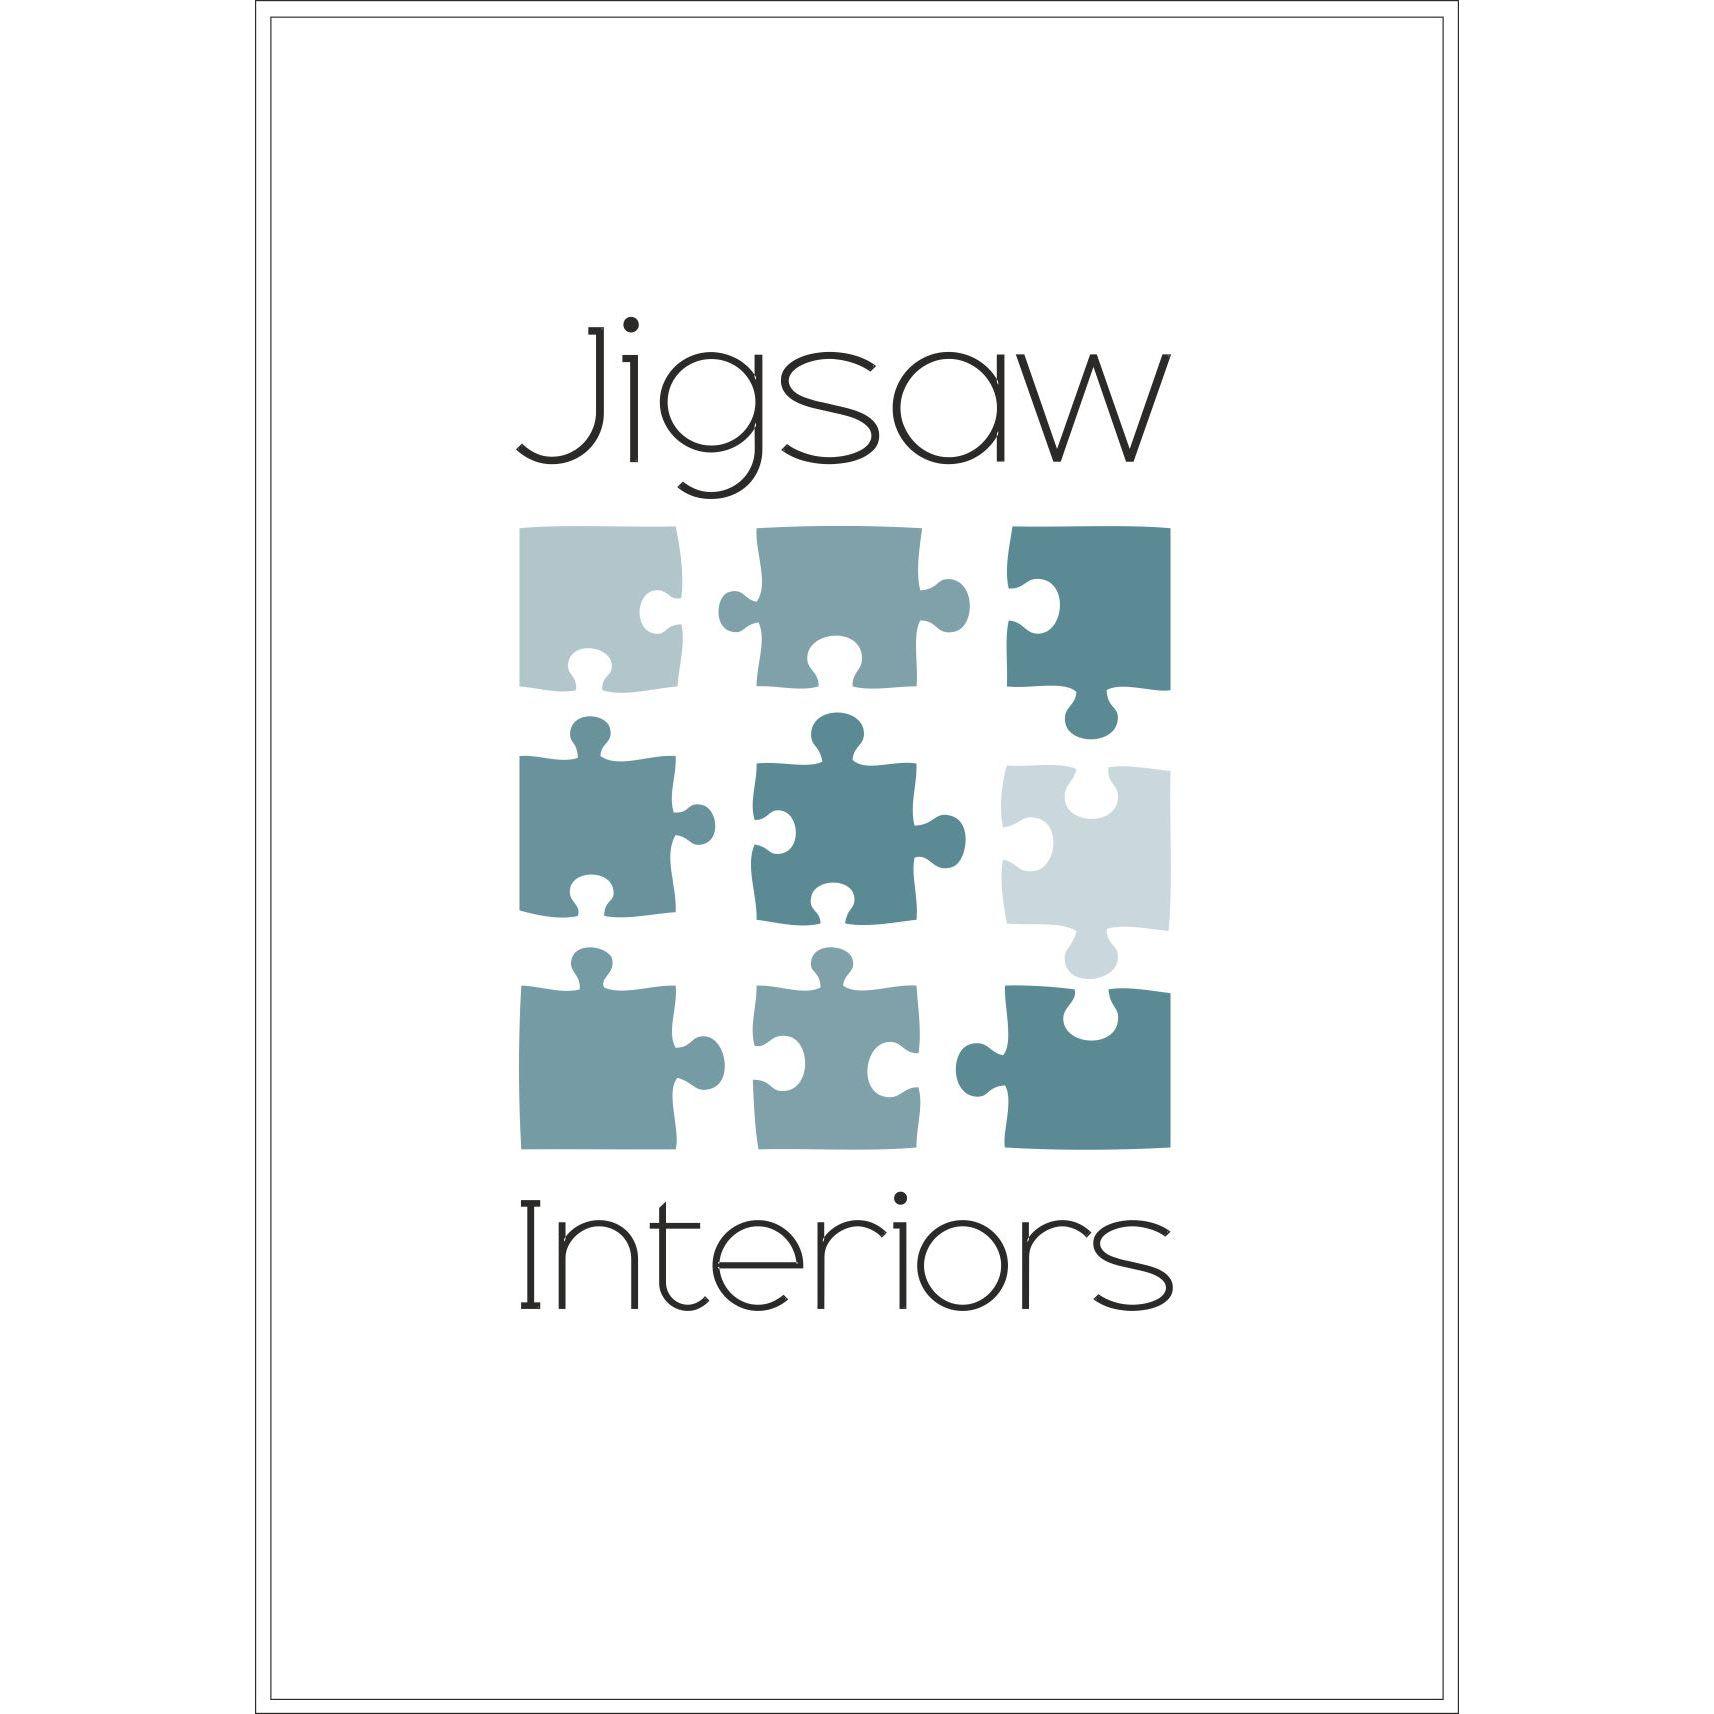 Jigsaw Interiors